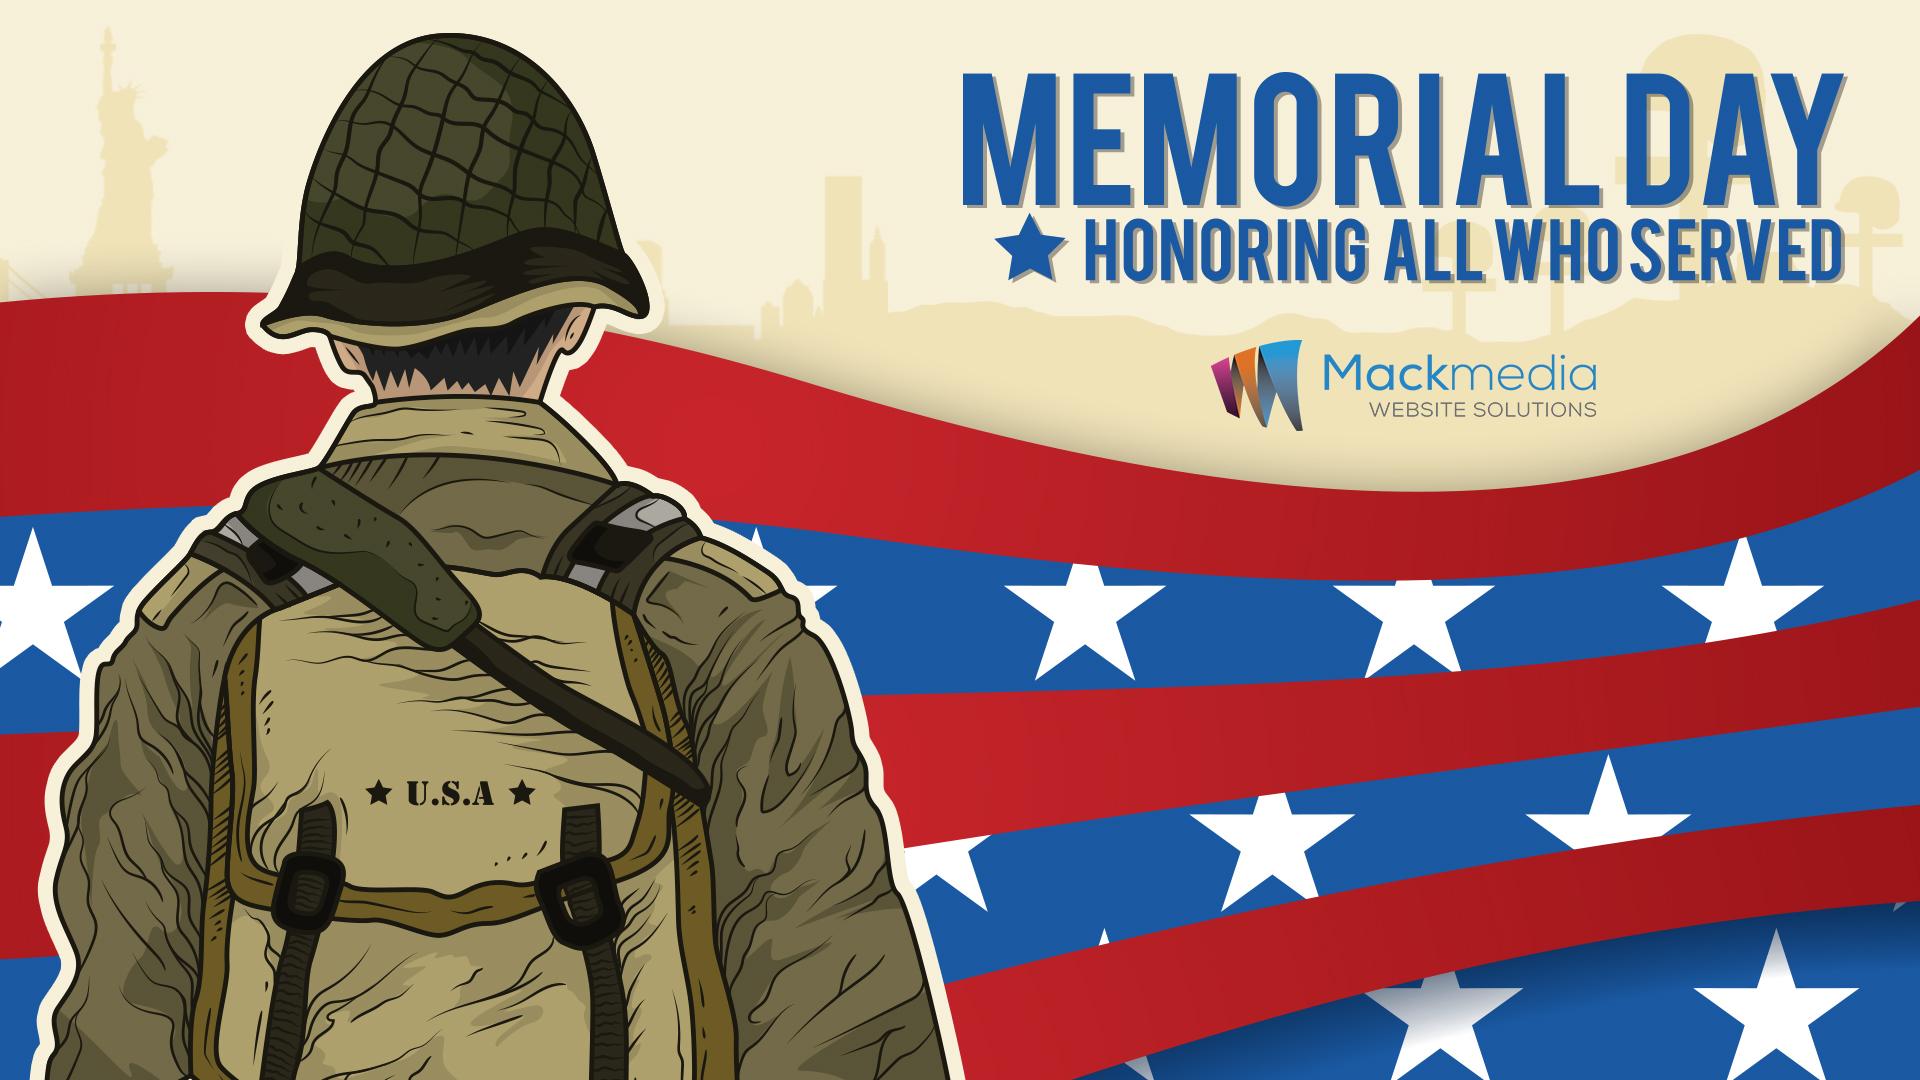 mackmedia-memorial-day-2018